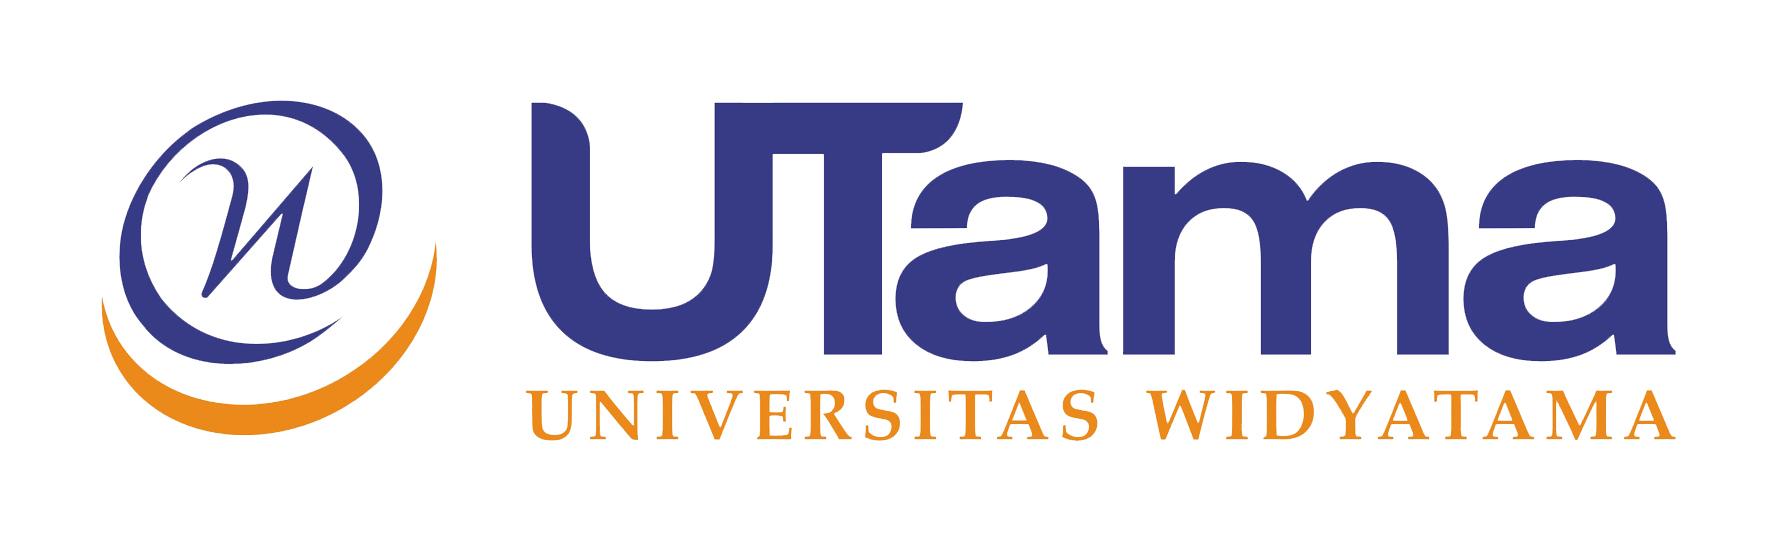 Logo Widyatama (Universitas Widyatama) Original PNG